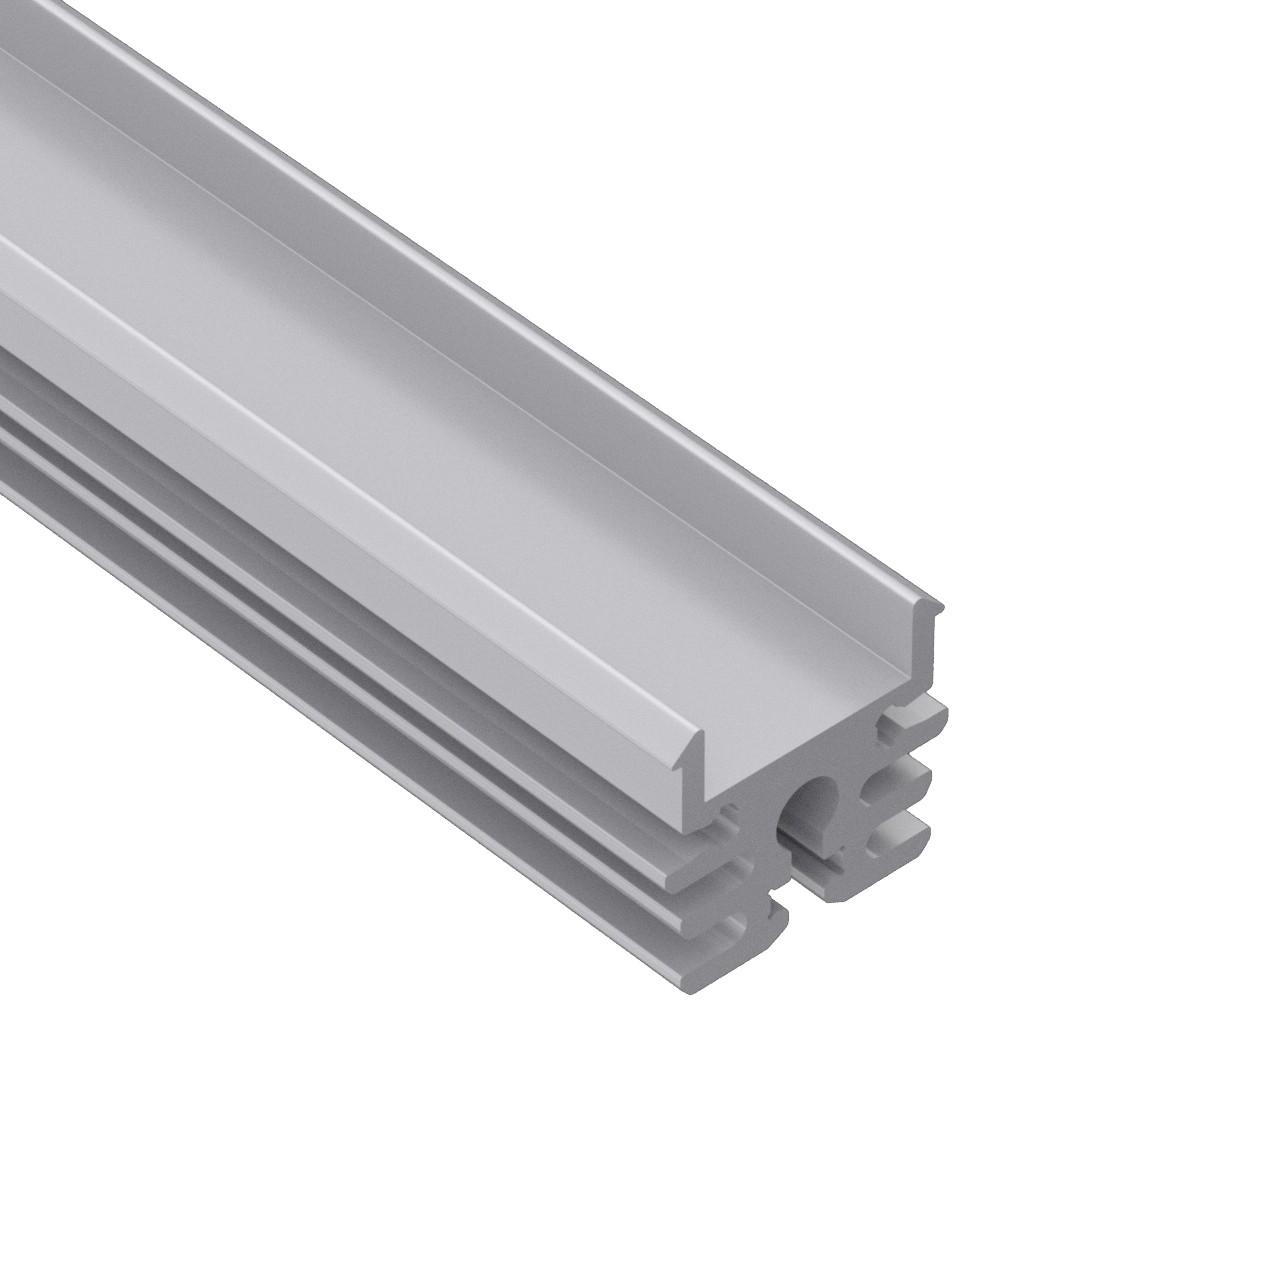 AP4 Surface aluminum led profile 18.7x22mm